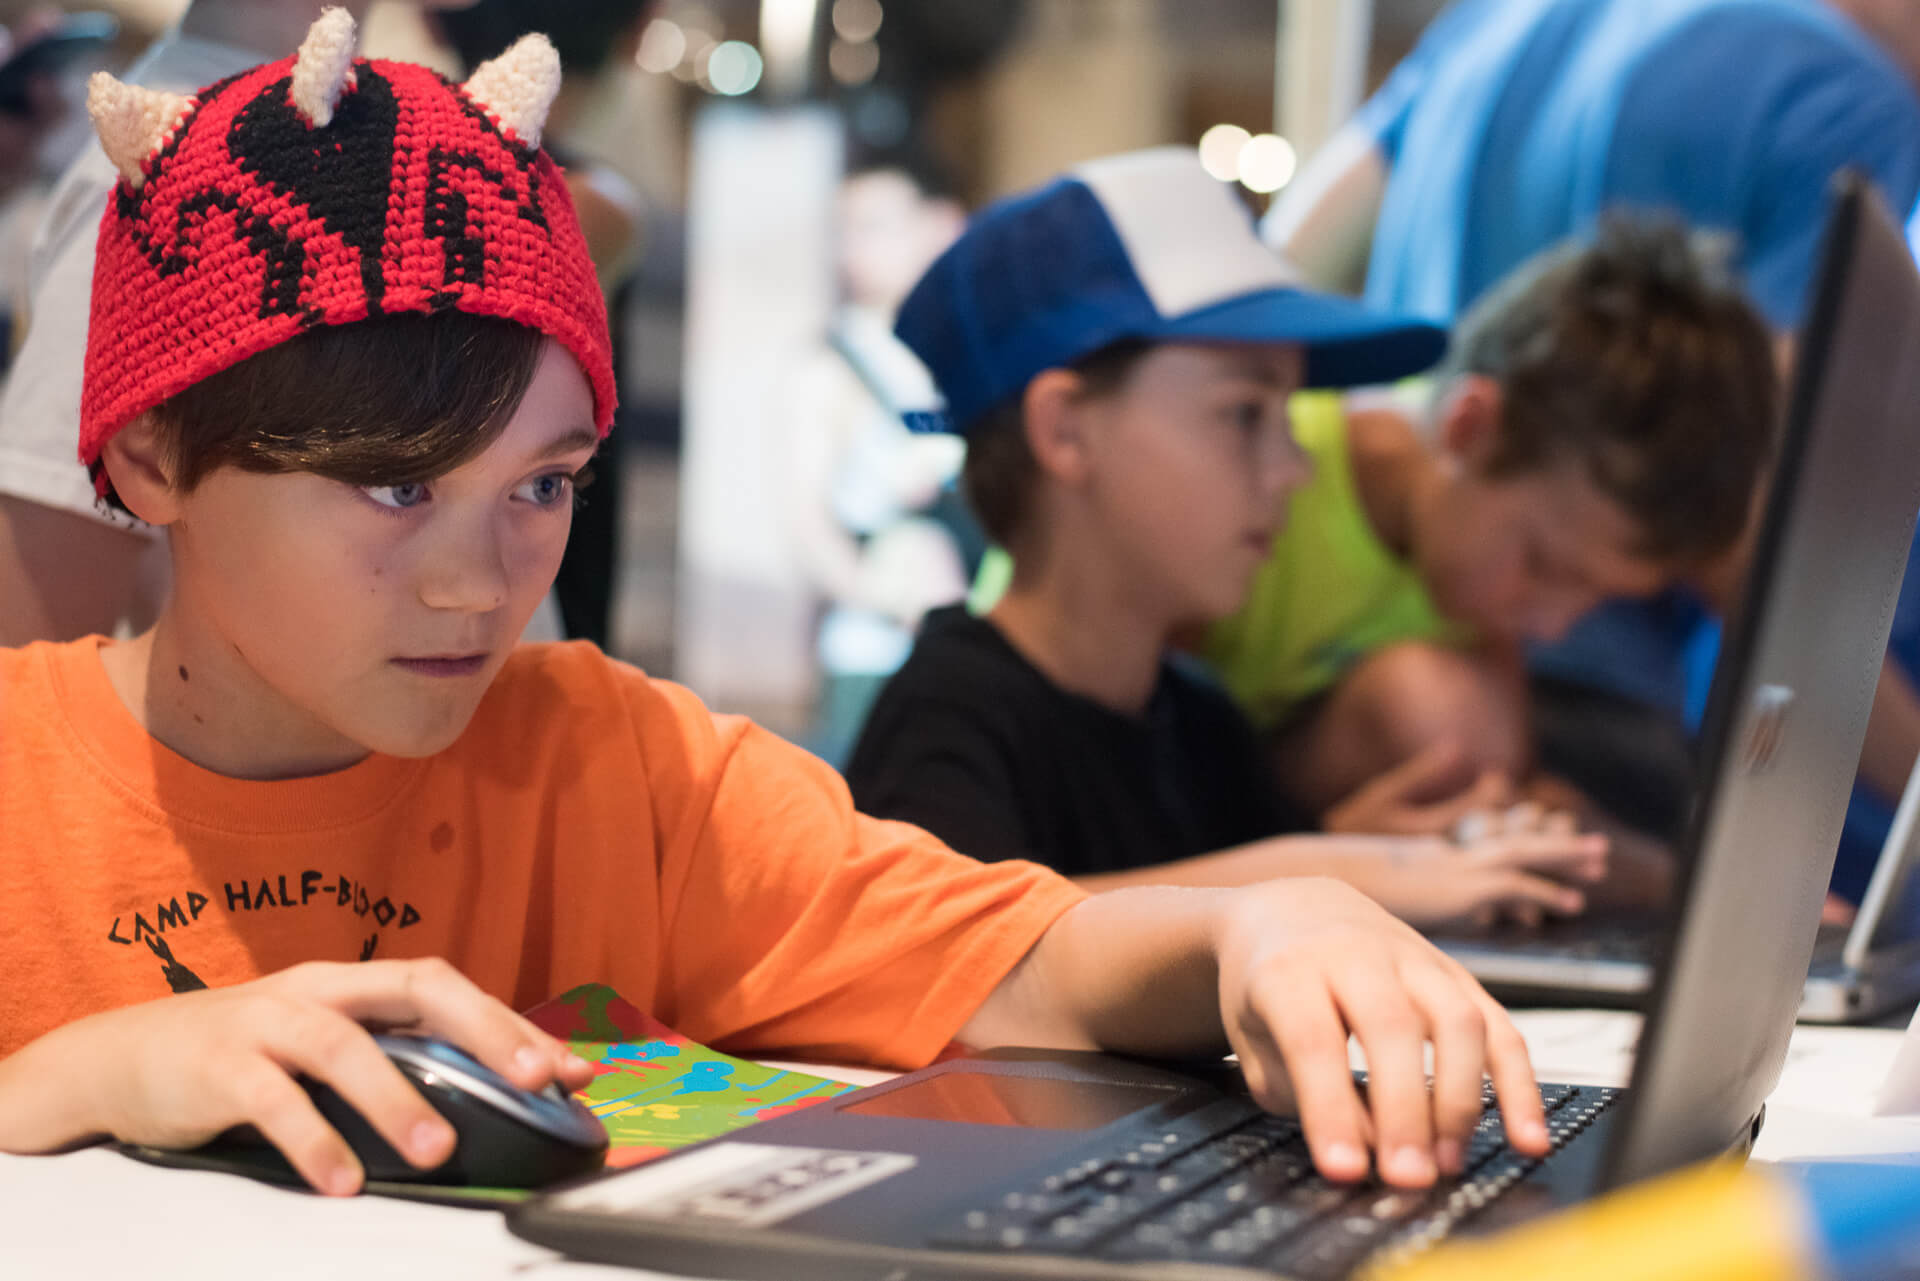 Videogamedesignclasskidstestgamesatmakerfairedetroit Kinvert - Computer game design for kids